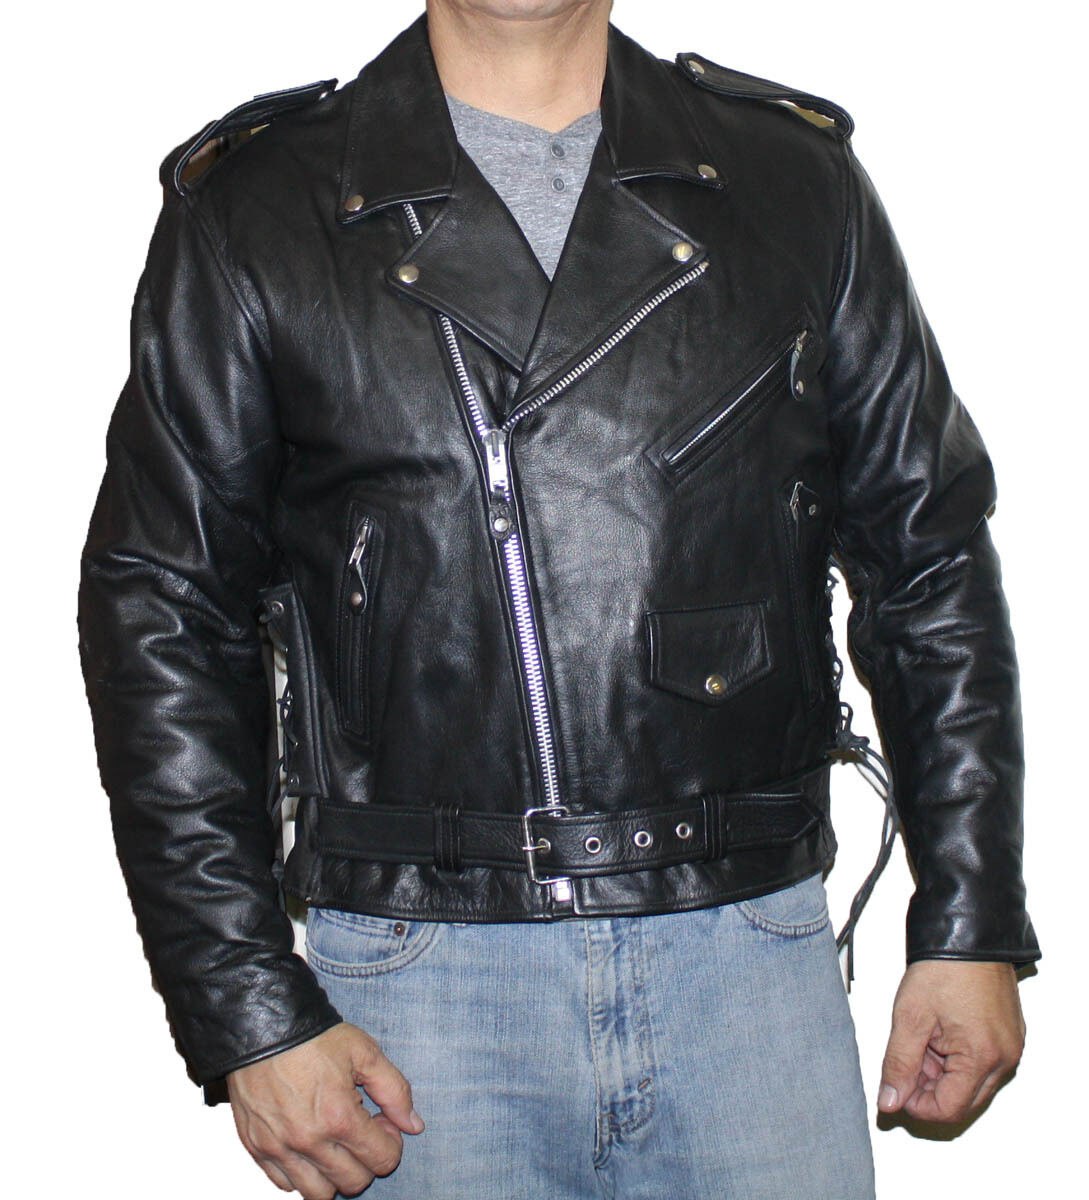 herren Genuine leder Classic Motorcycle Biker Style Quality jacke